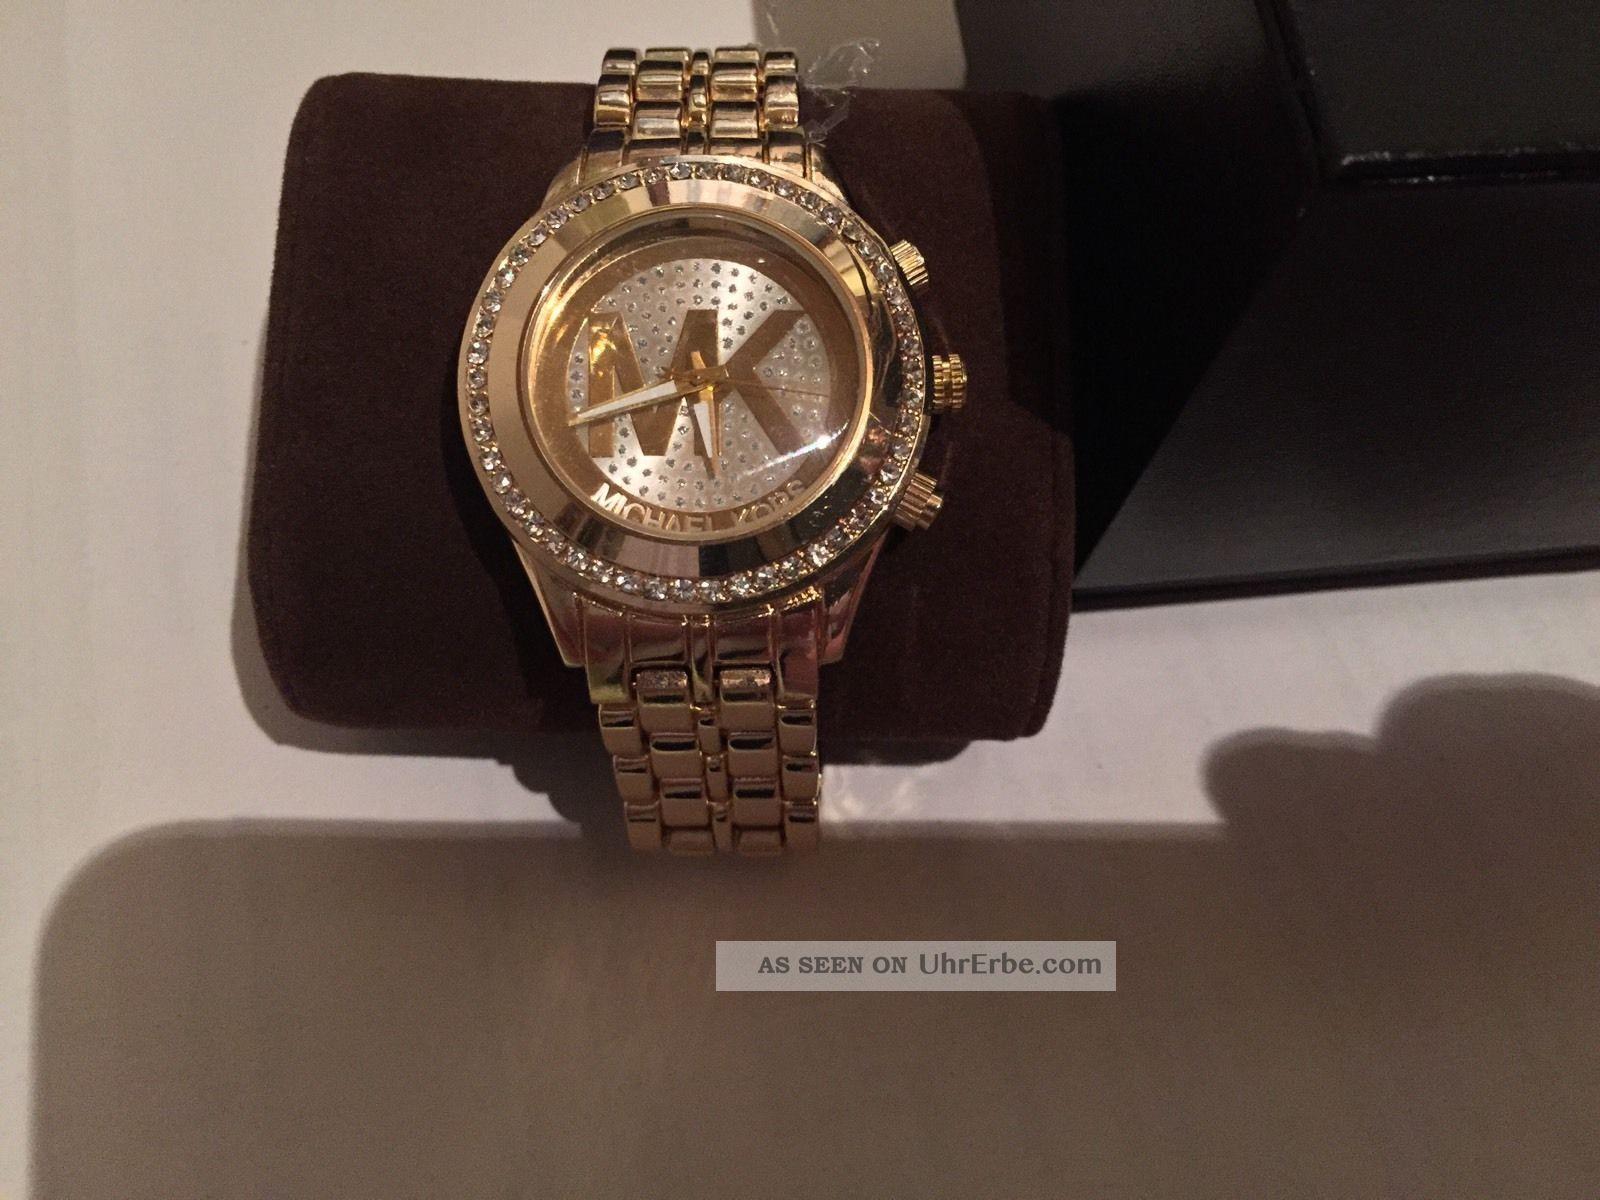 Nagelneue Michael Kors Uhr In Gold Armbanduhren Bild